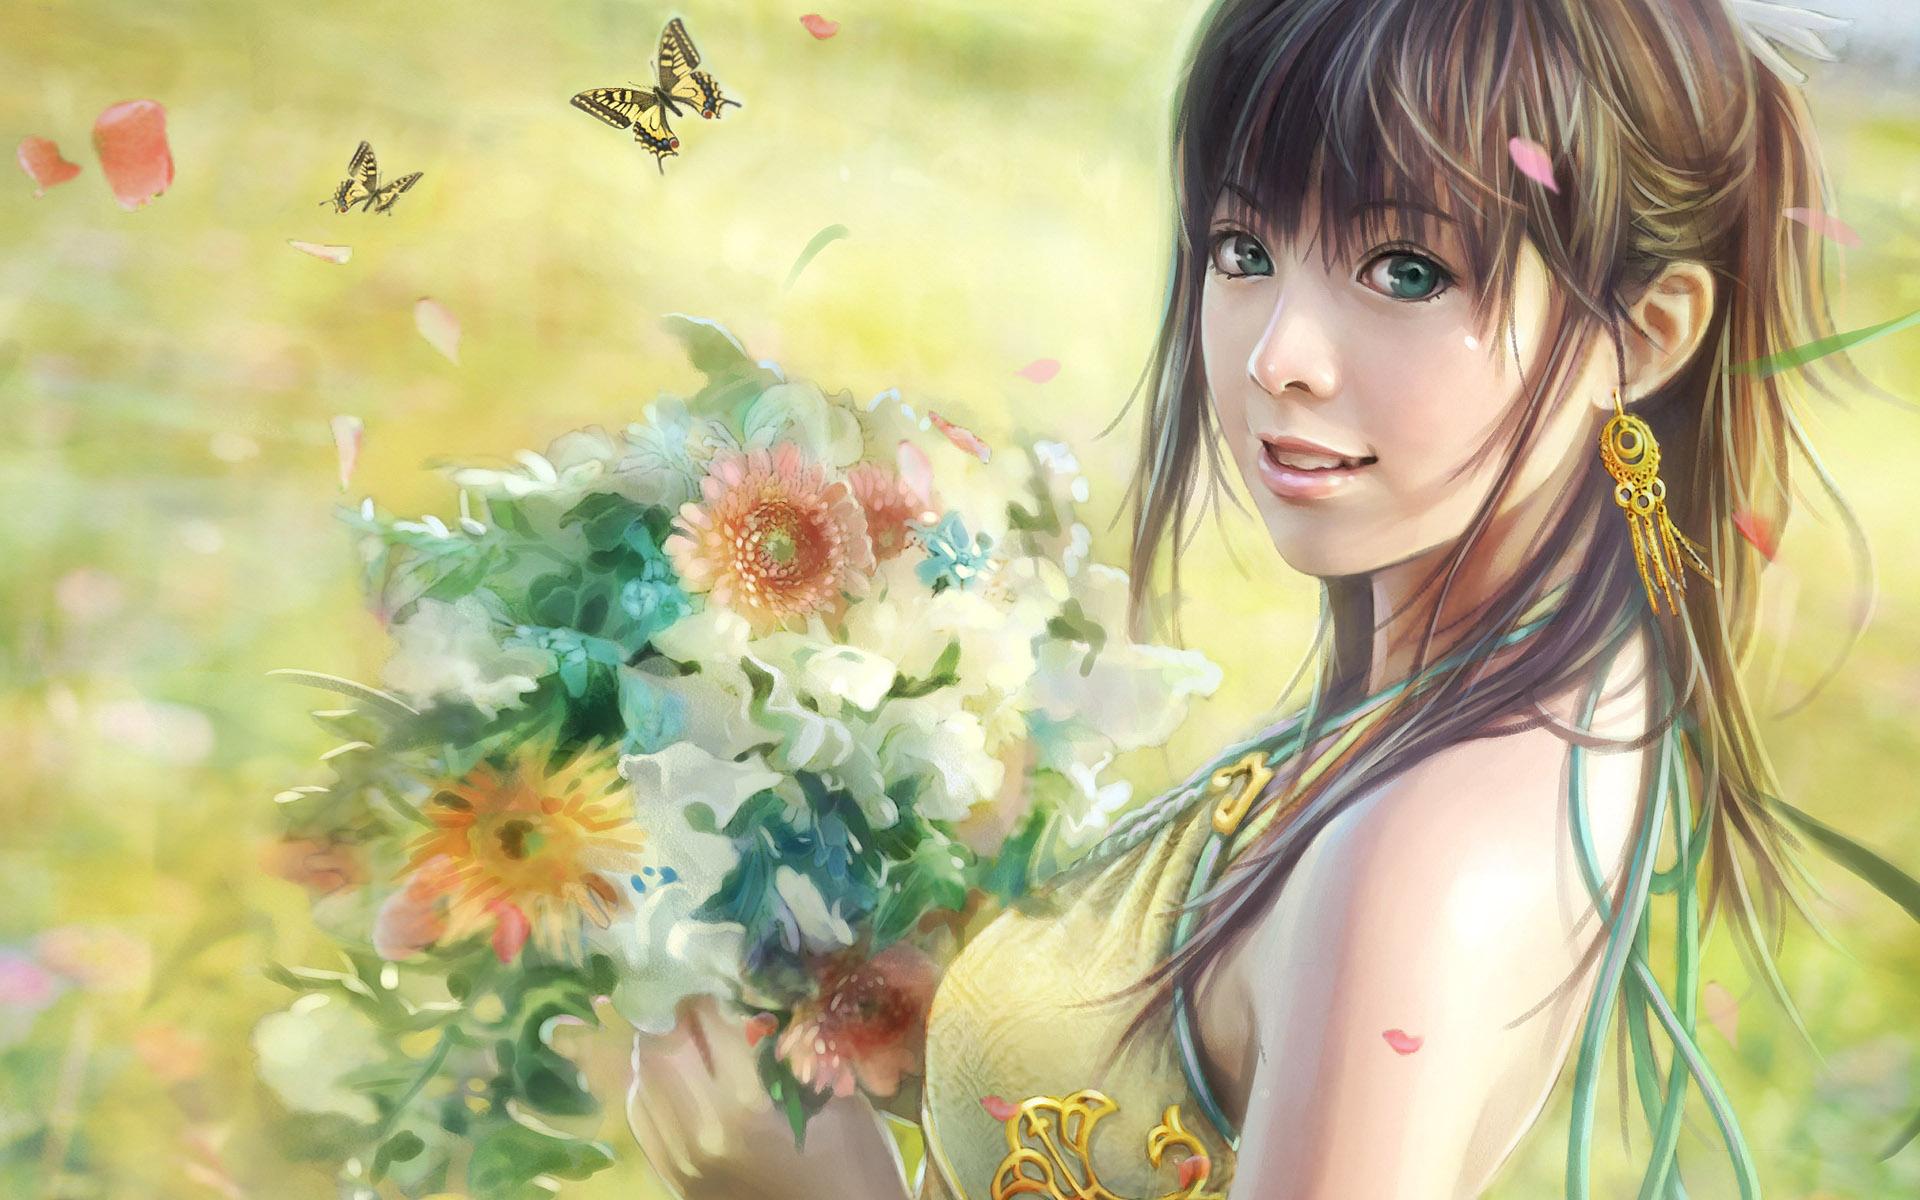 Beautiful Girl Hd Wallpapers 1080p Widescreen Wallpapers Girl Group 58